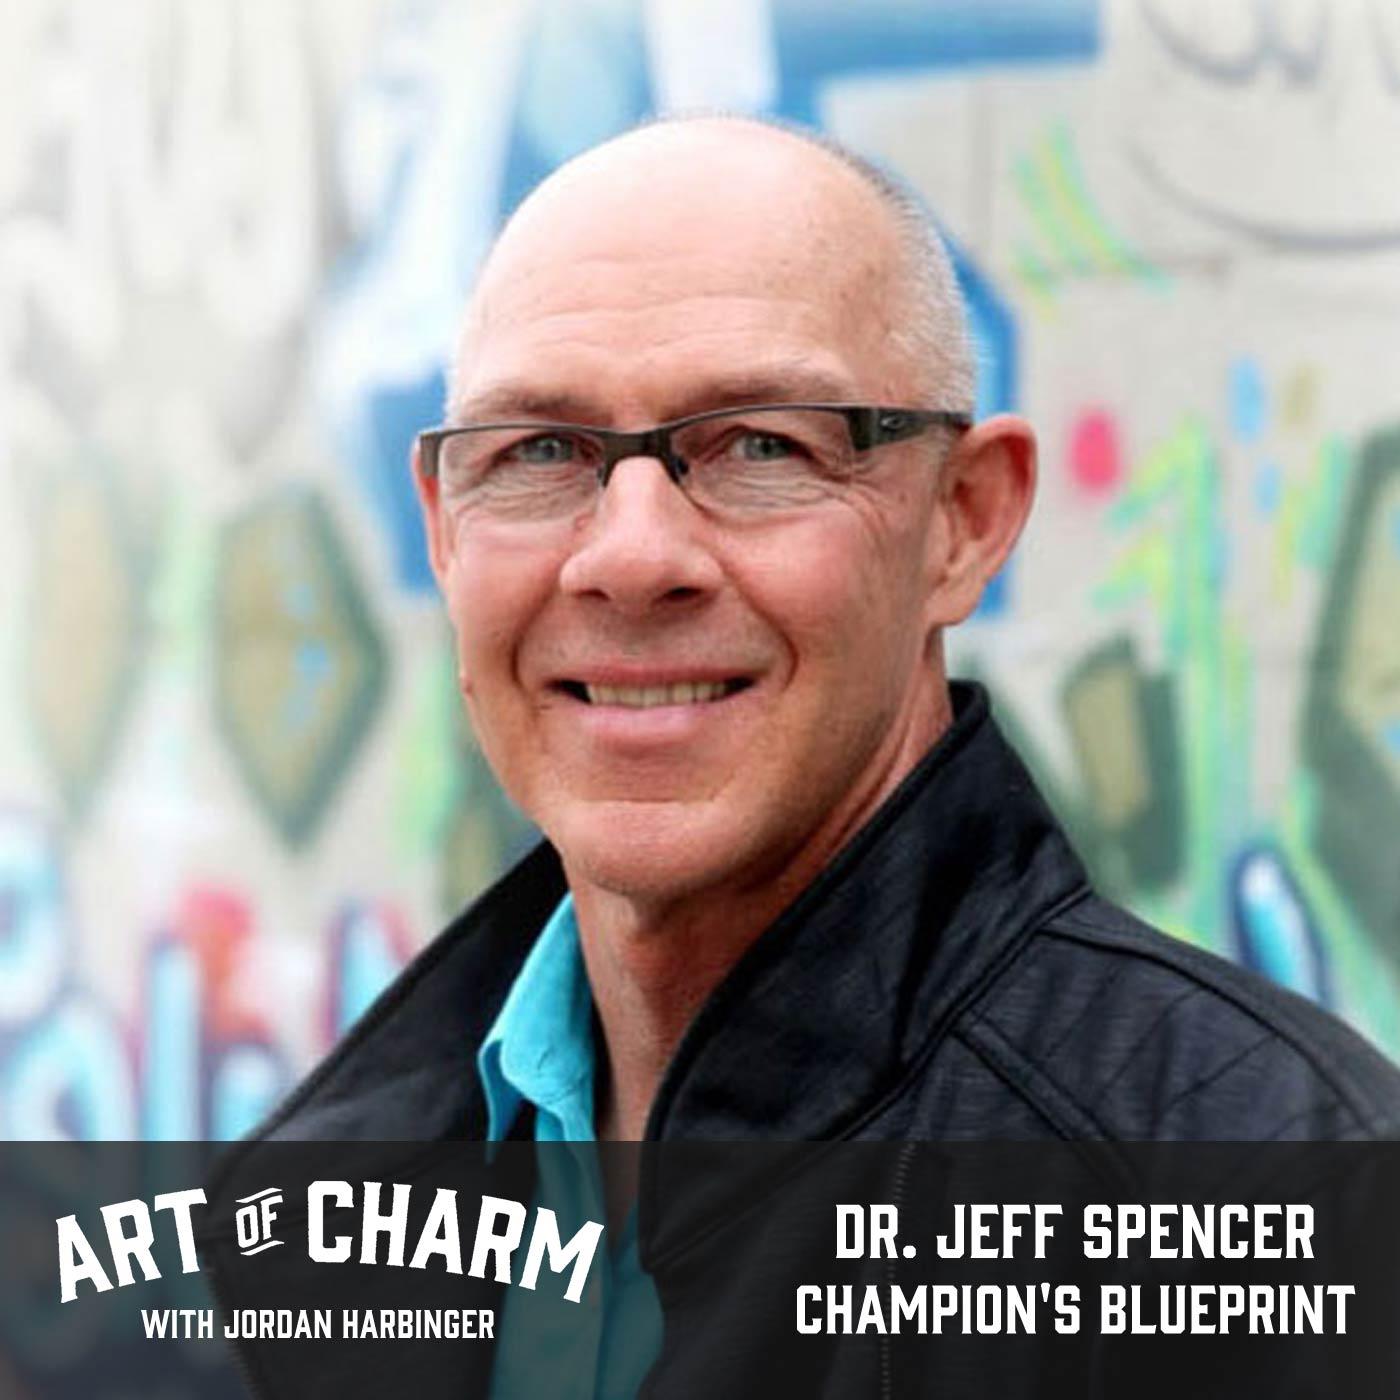 dr jeff spencer chiropractic